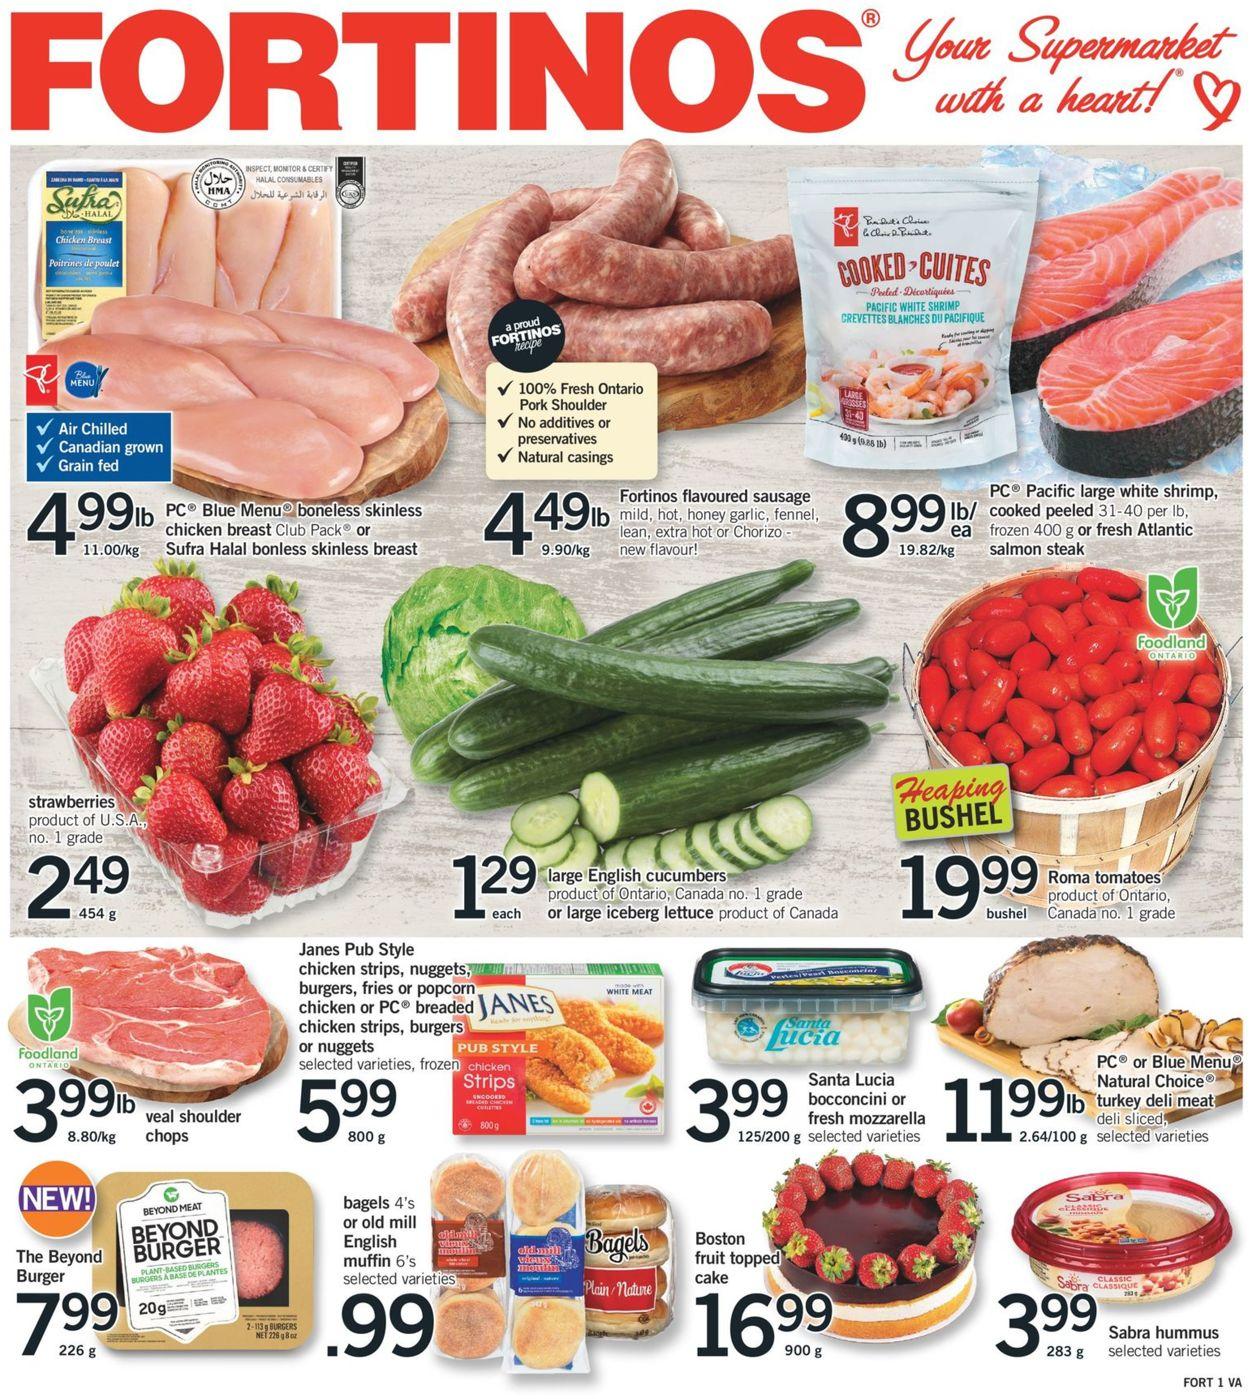 Fortinos Flyer - 08/15-08/21/2019